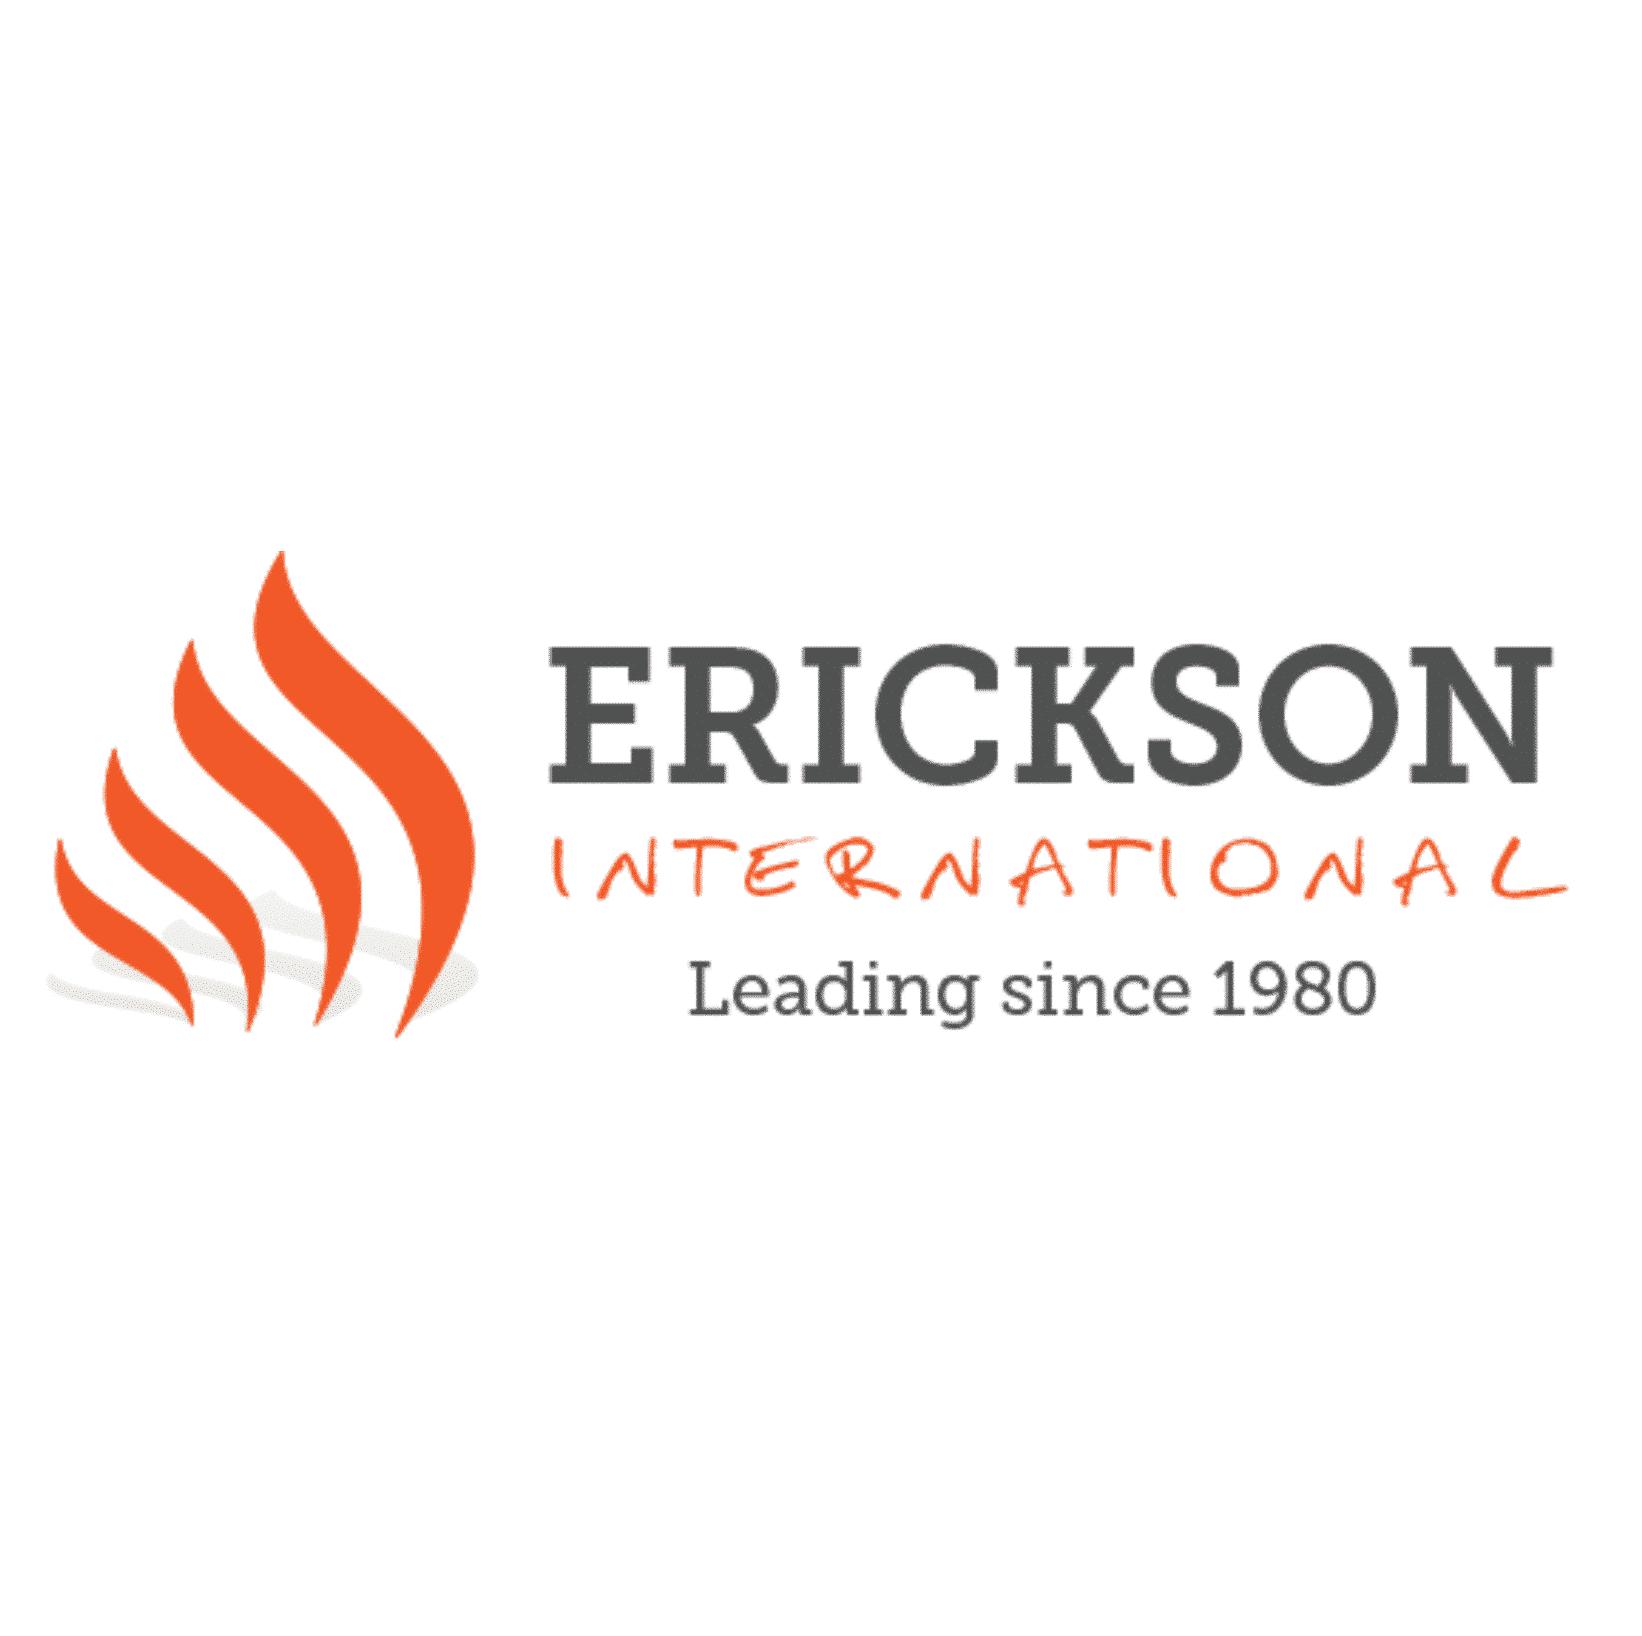 Erickson International